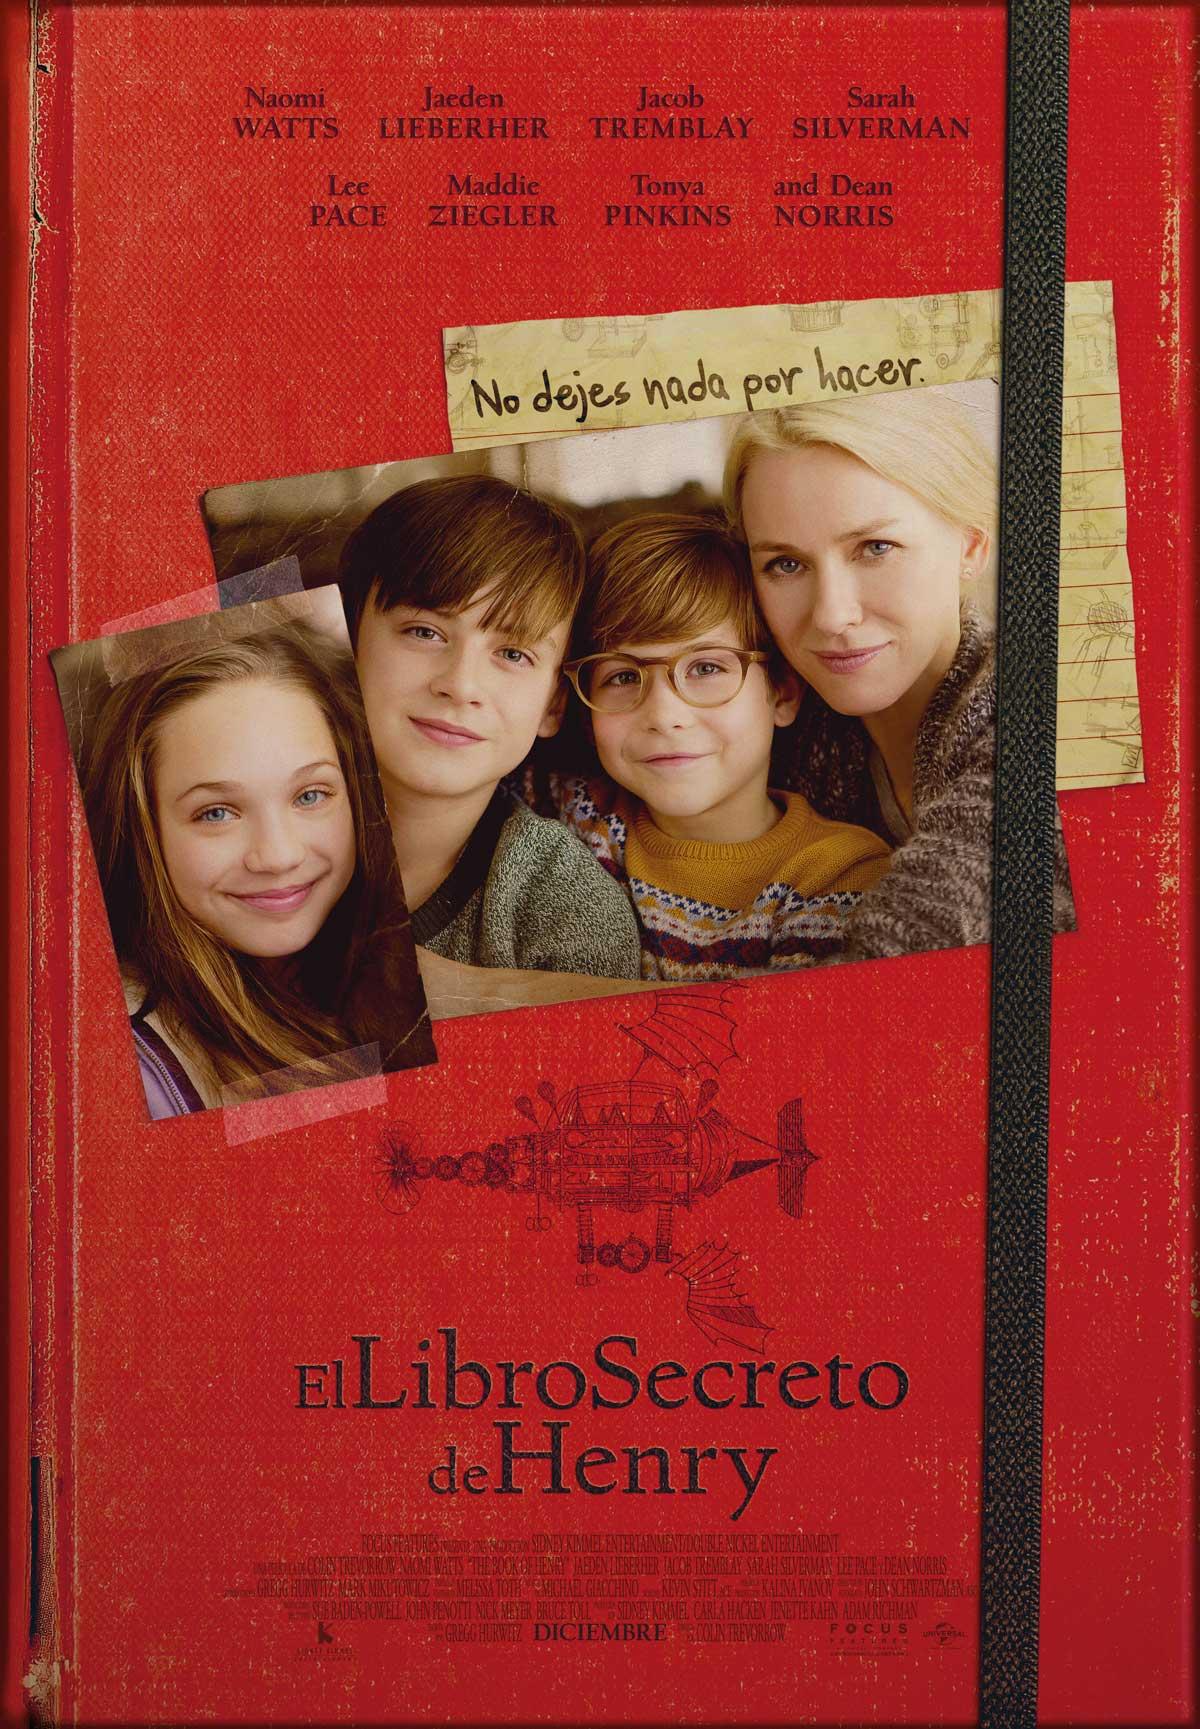 El libro secreto de Henry - Película 2017 - SensaCine.com